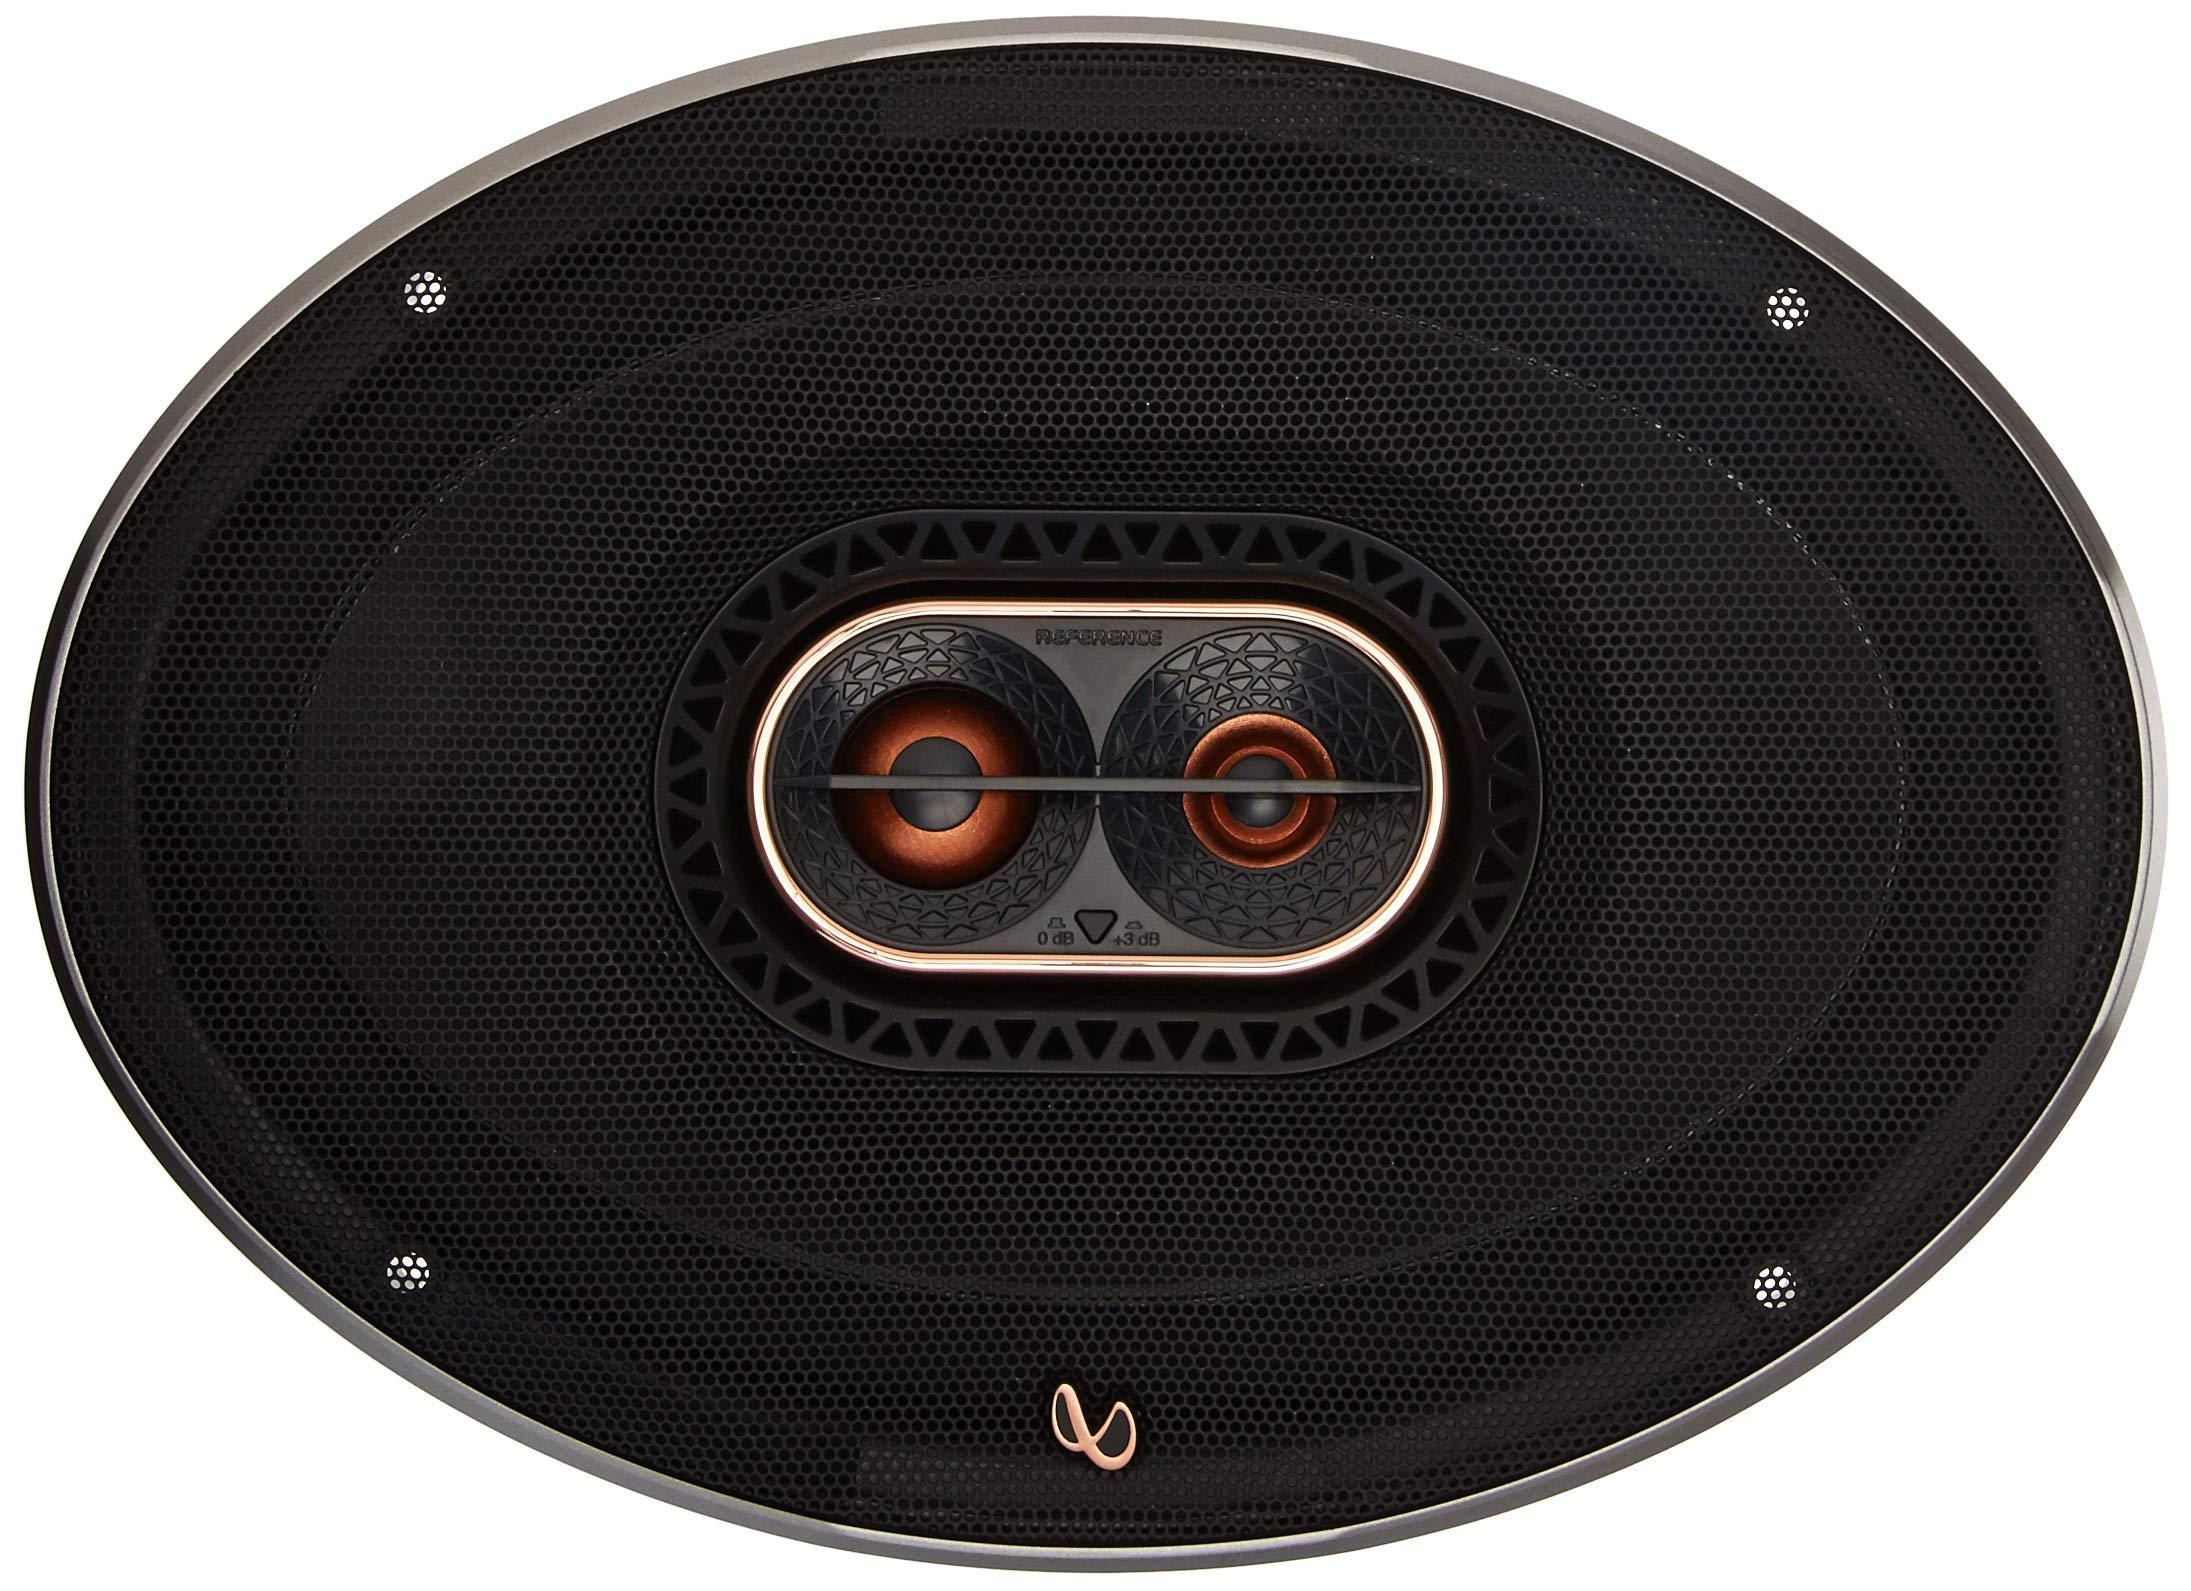 Infinity REF-9623ix 300W Max 6'' x 9'' 3-Way Car Audio Speaker with Edge-Driven, Textile Tweeters